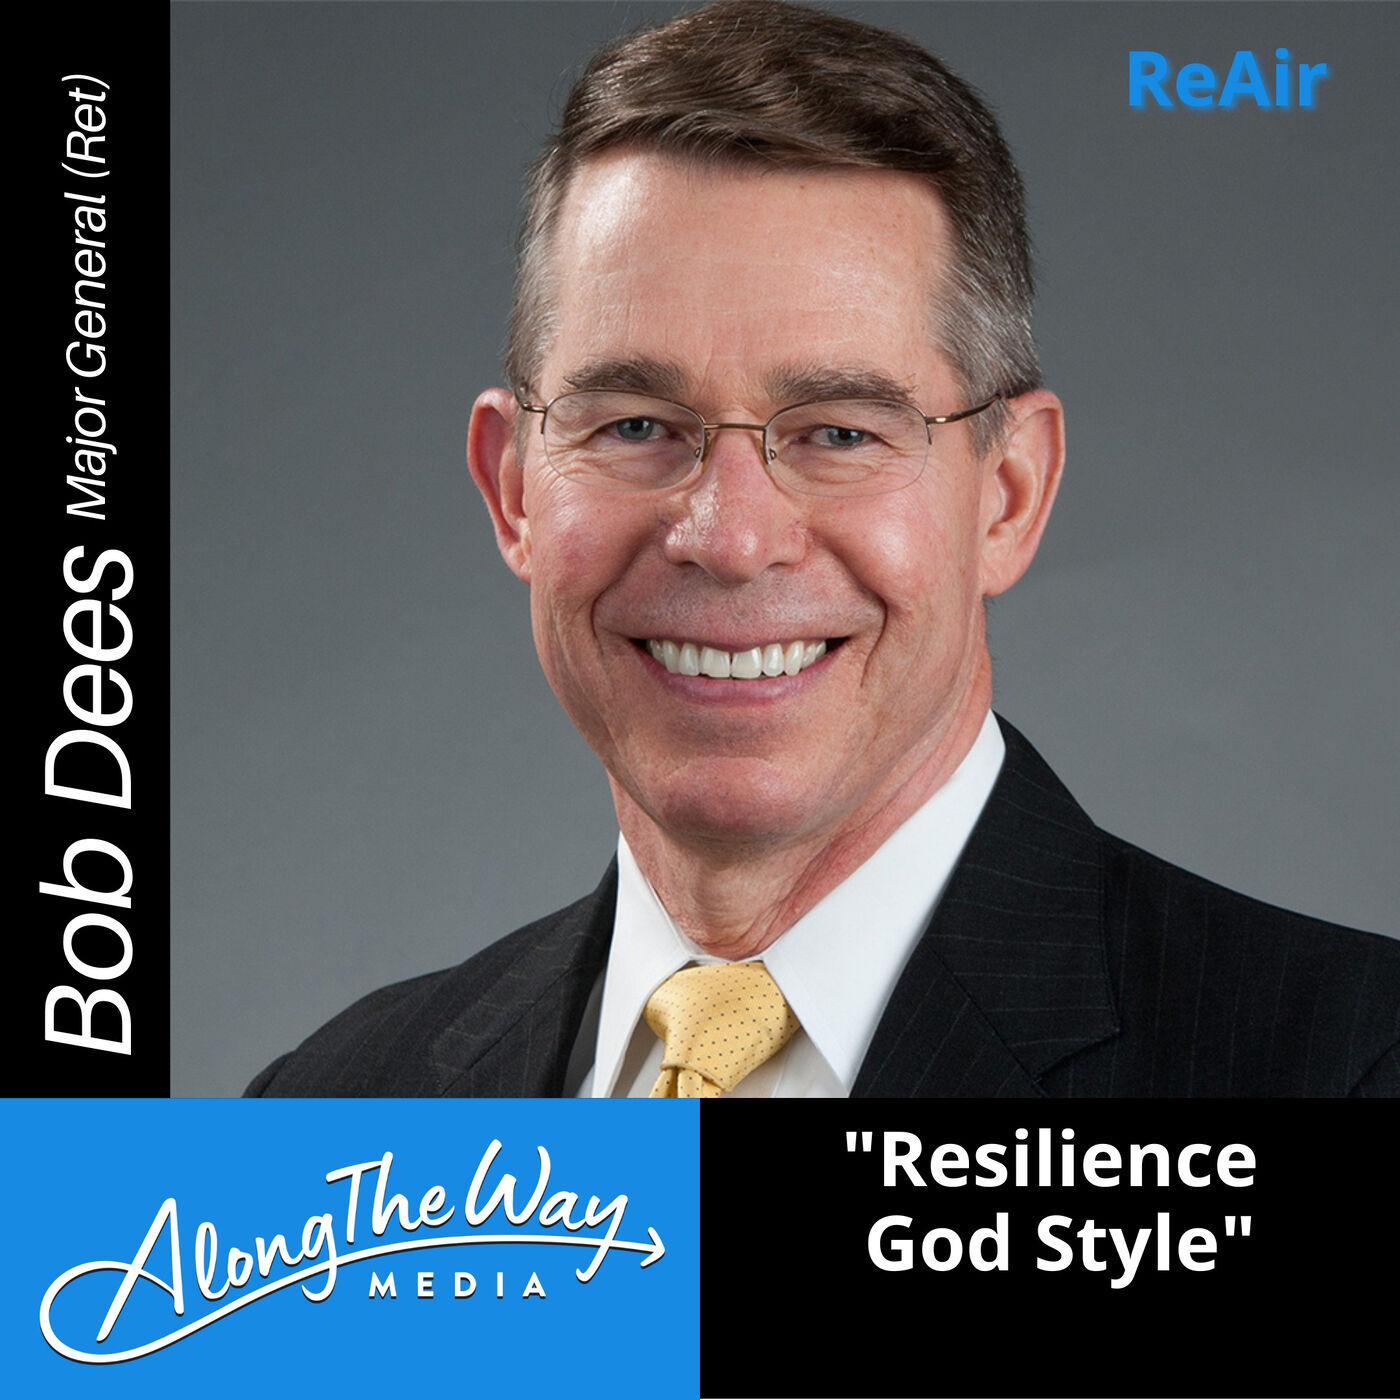 Resilience God Style - Major General Bob Dees (Retired) REAIR